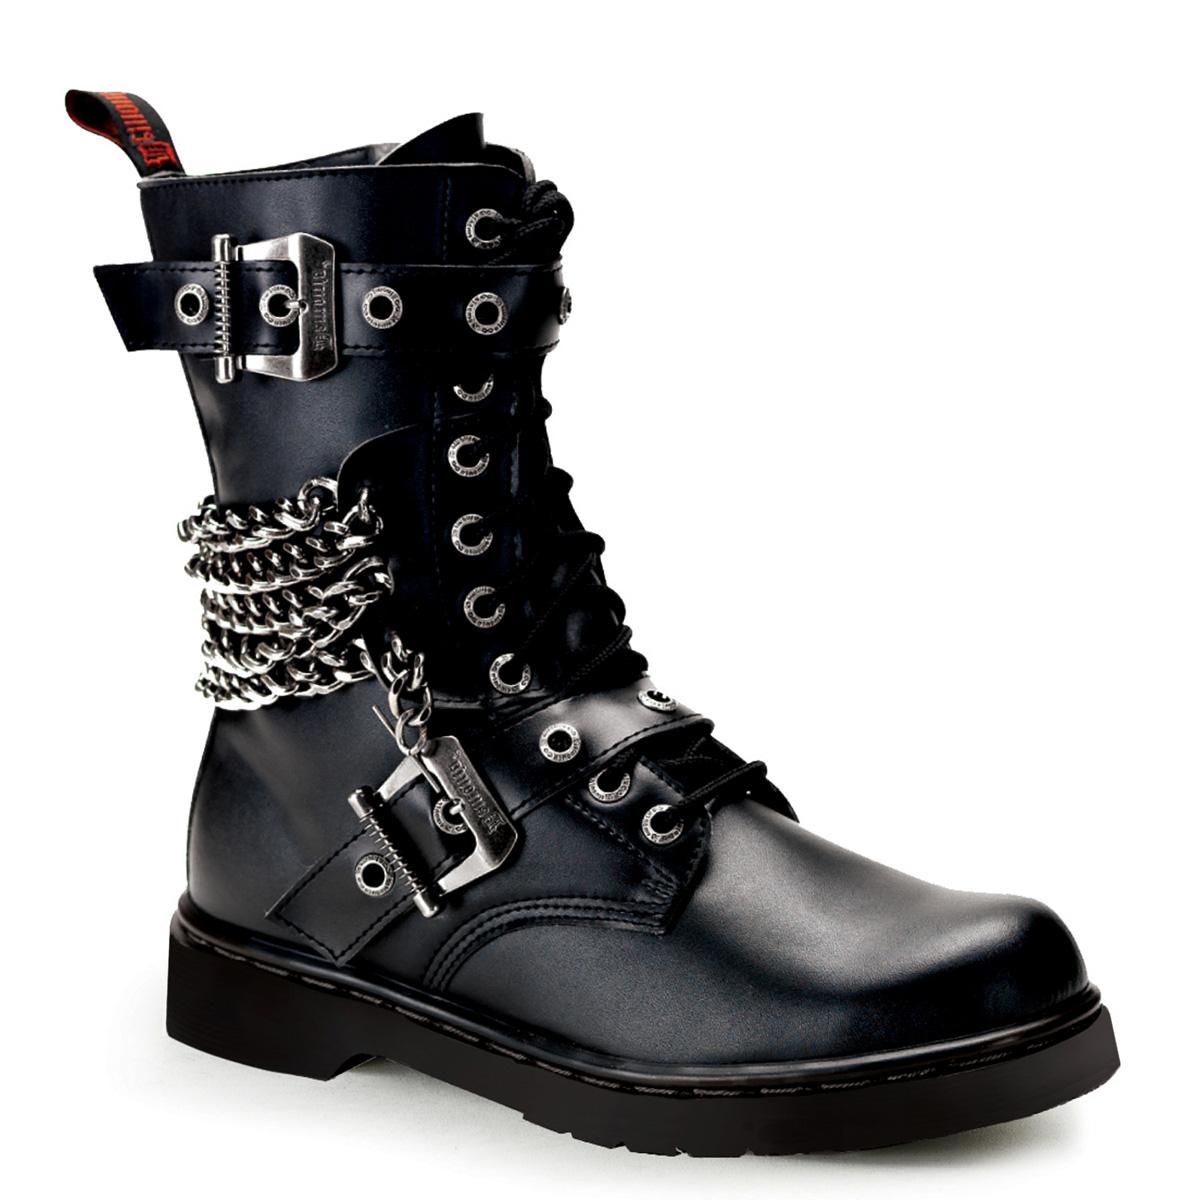 DEMONIA DEFIANT Men's Calf/Ankle Vegan Combat Boots | eBay